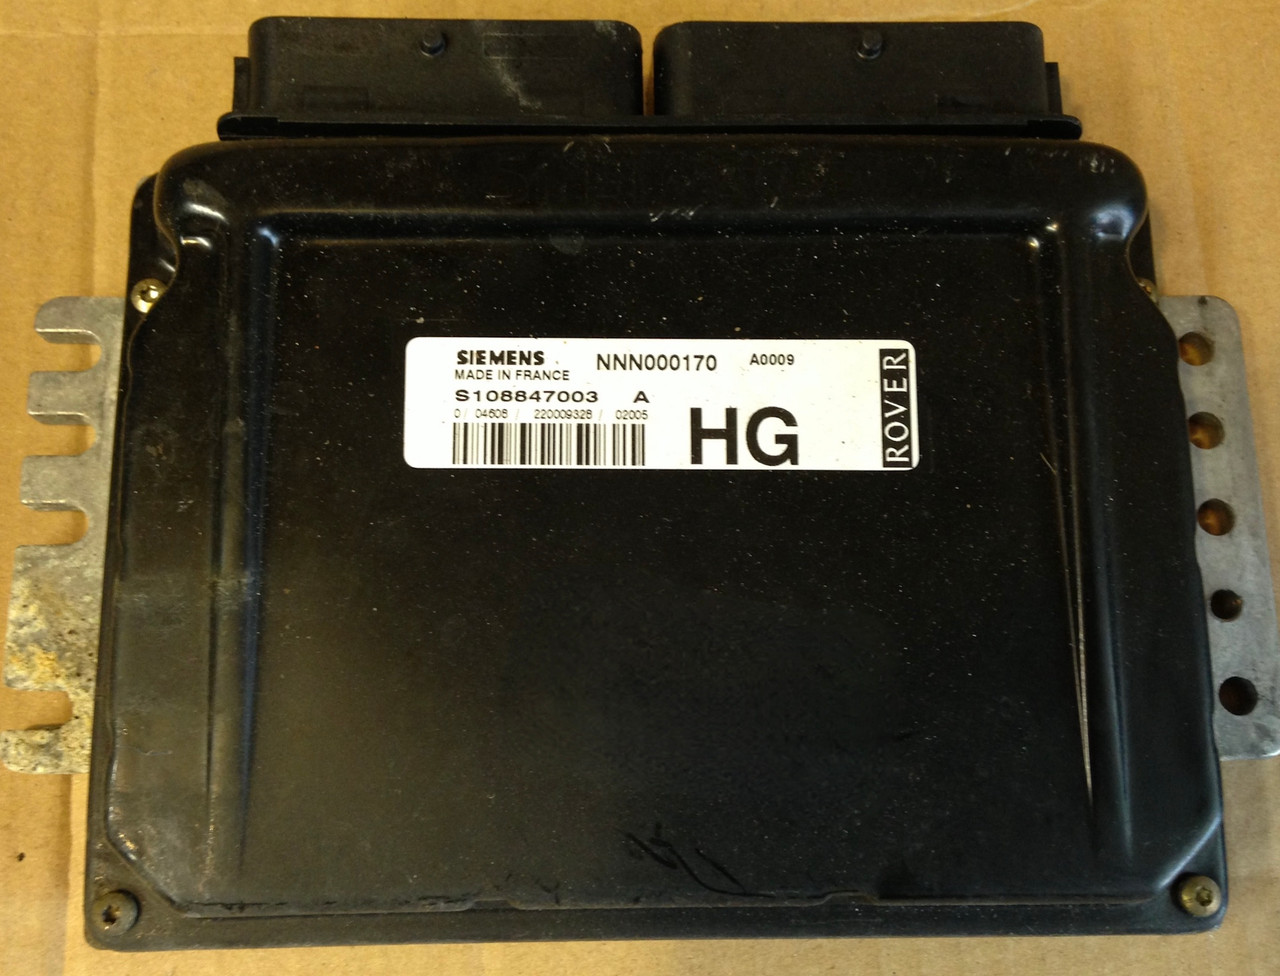 Rover 75 2.5L V6 (KV6), S108847003A, S108847003 A, NNN000170, HG